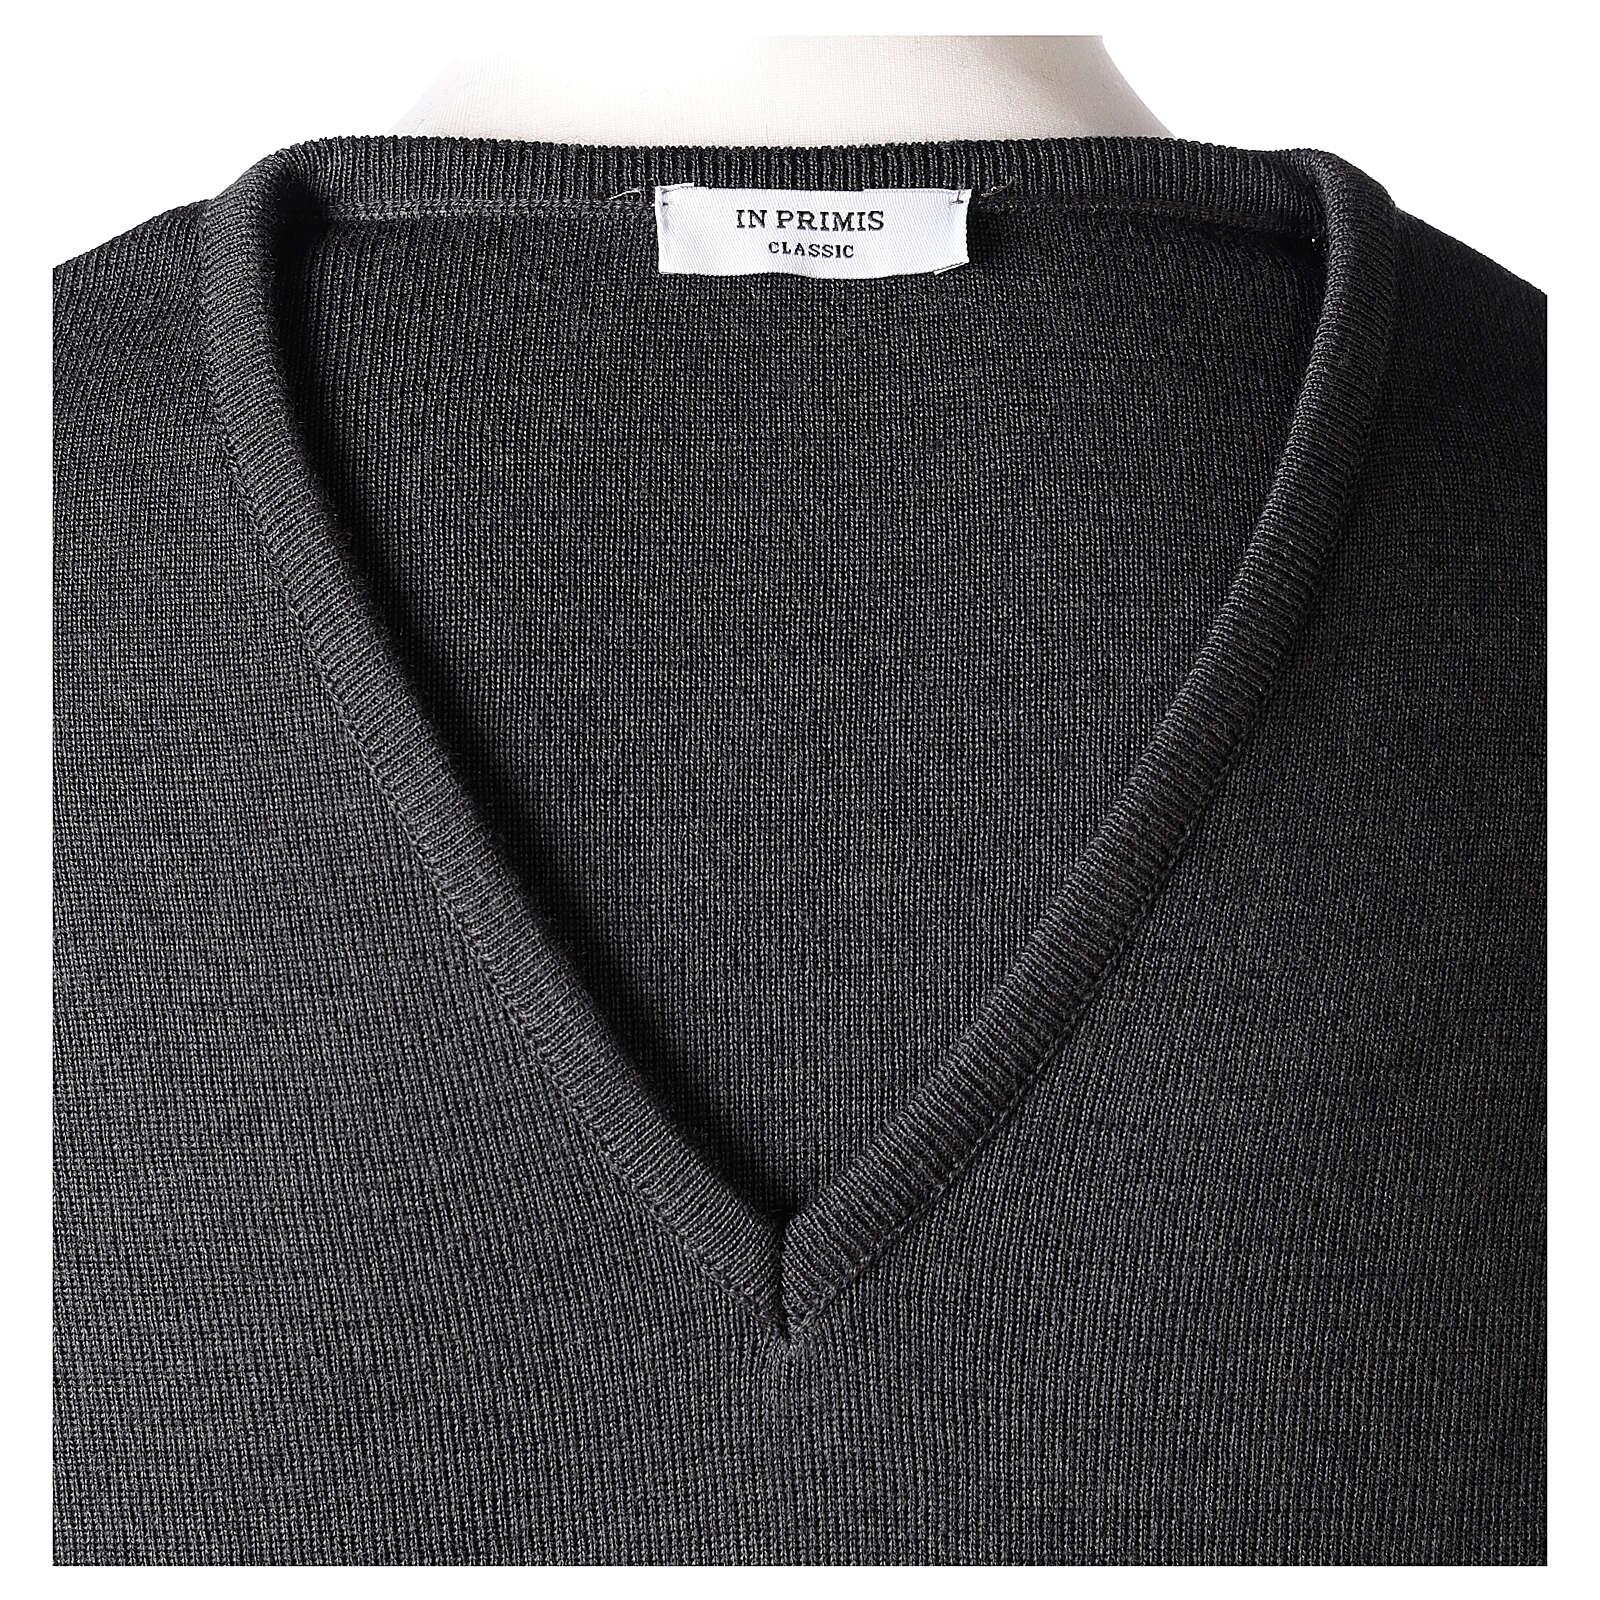 V-neck grey clergy jumper plain fabric 50% acrylic 50% merino wool 4